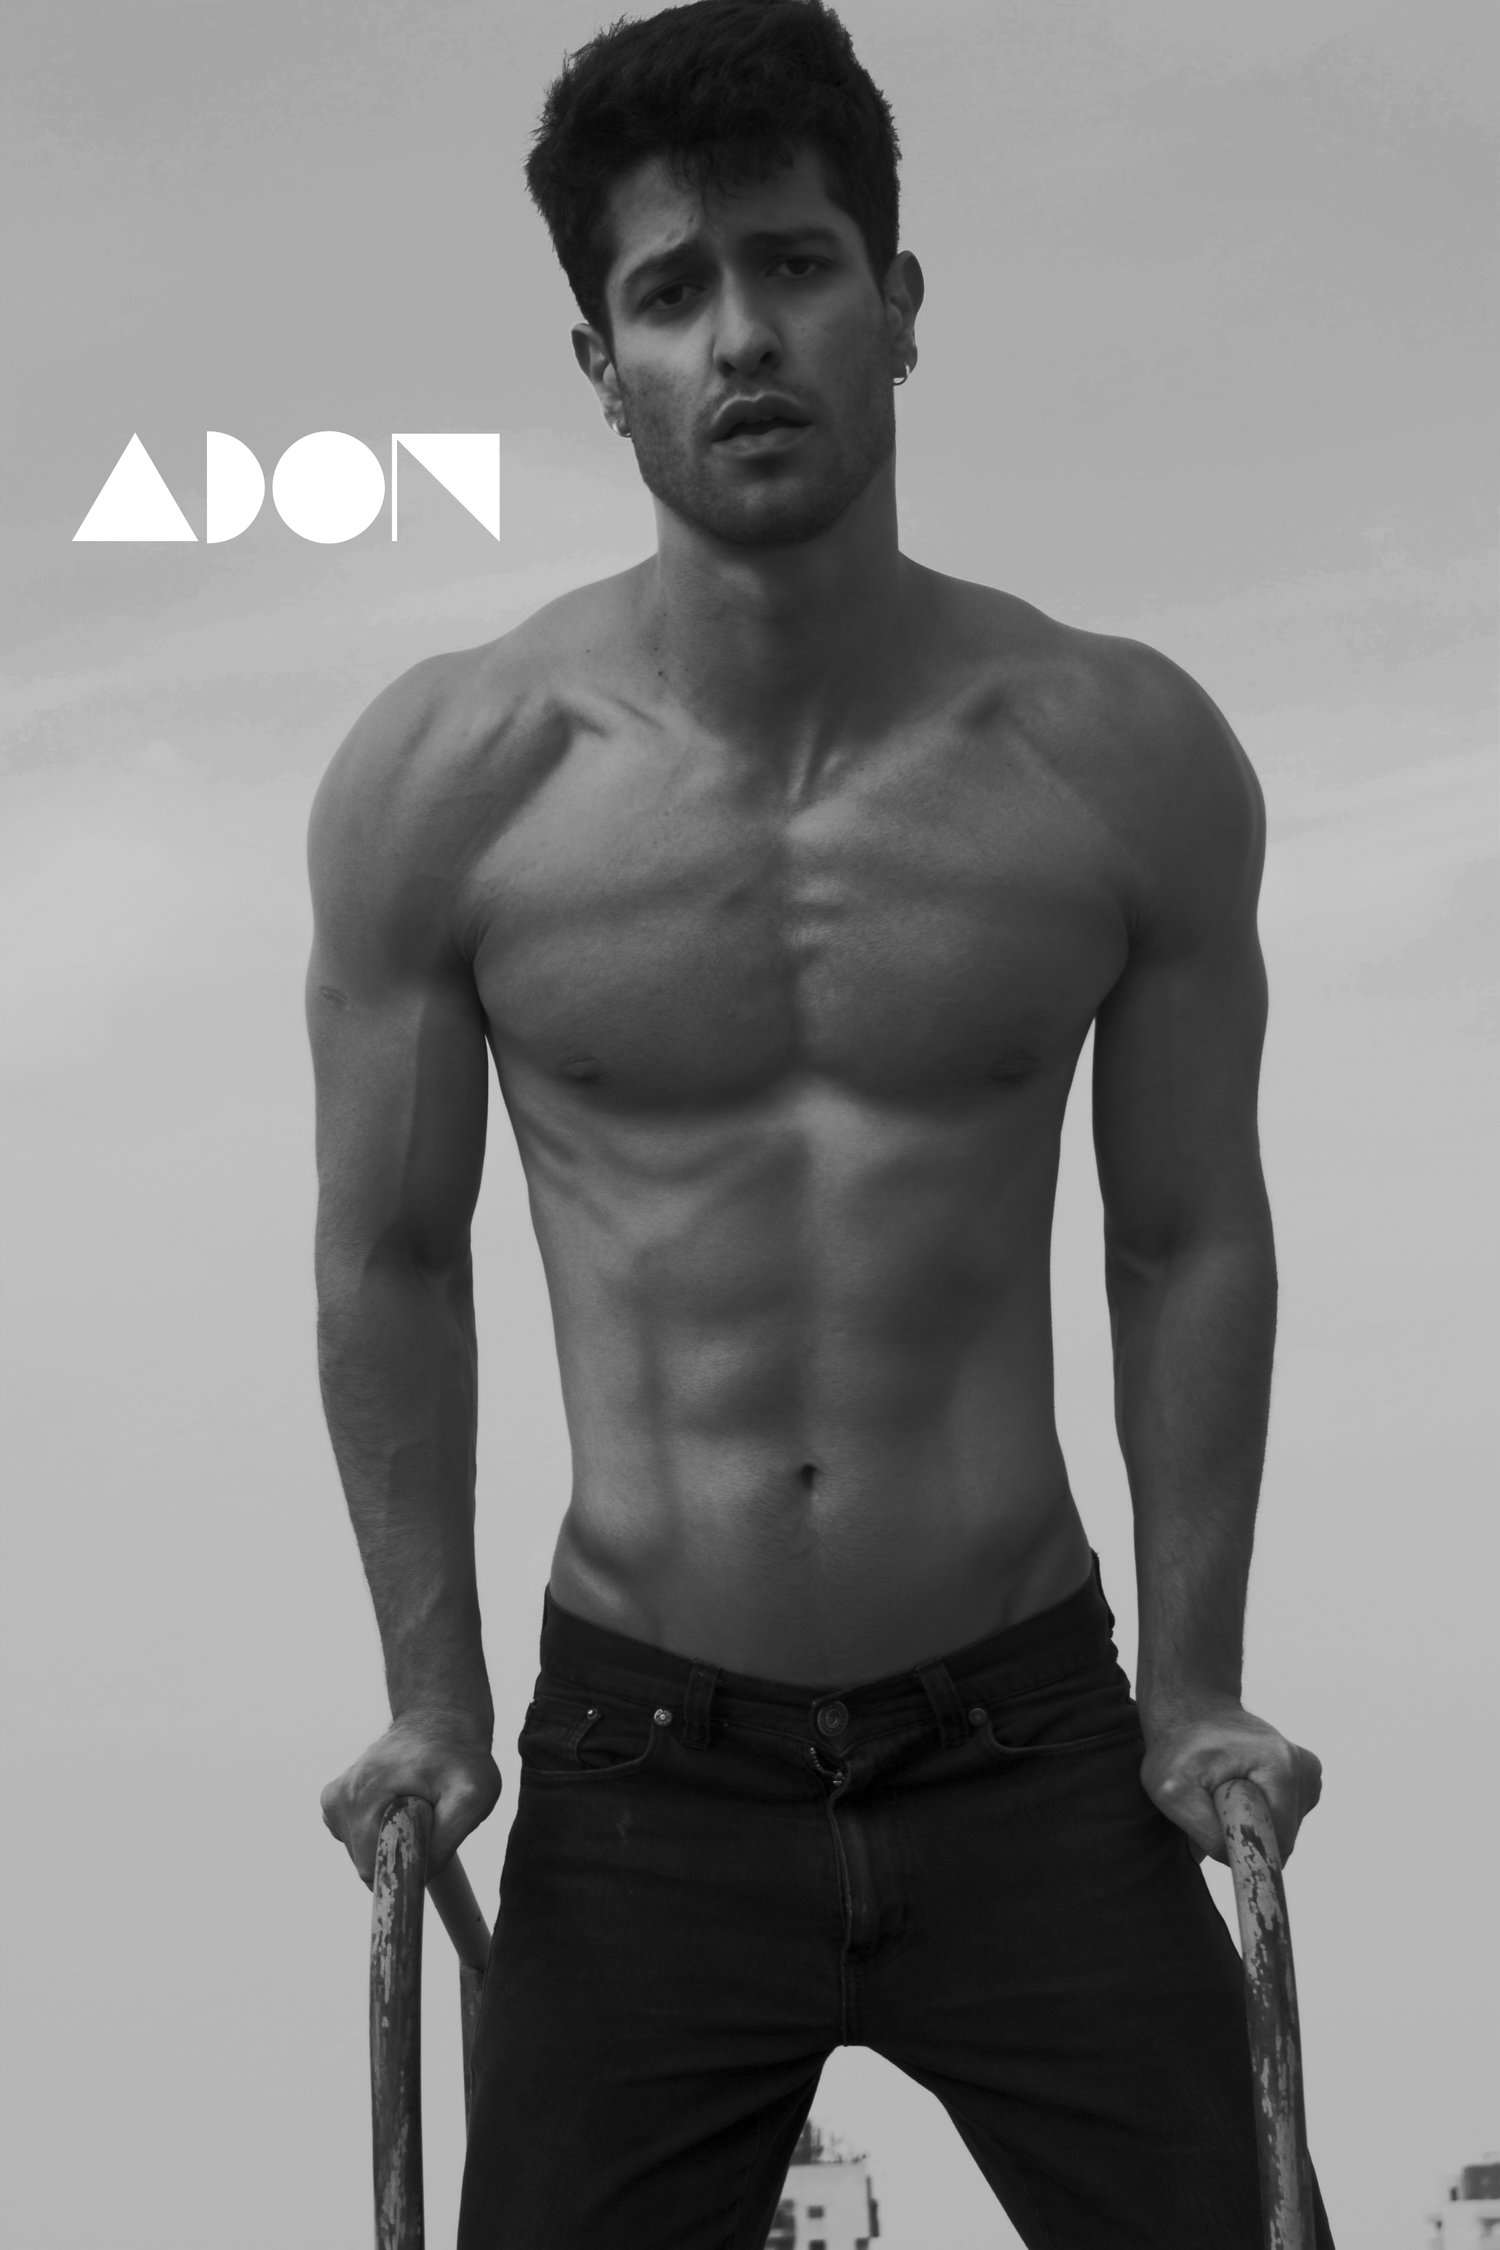 Adon Exclusive: Model Gabriel Fuzaro By Luis Ribeiro